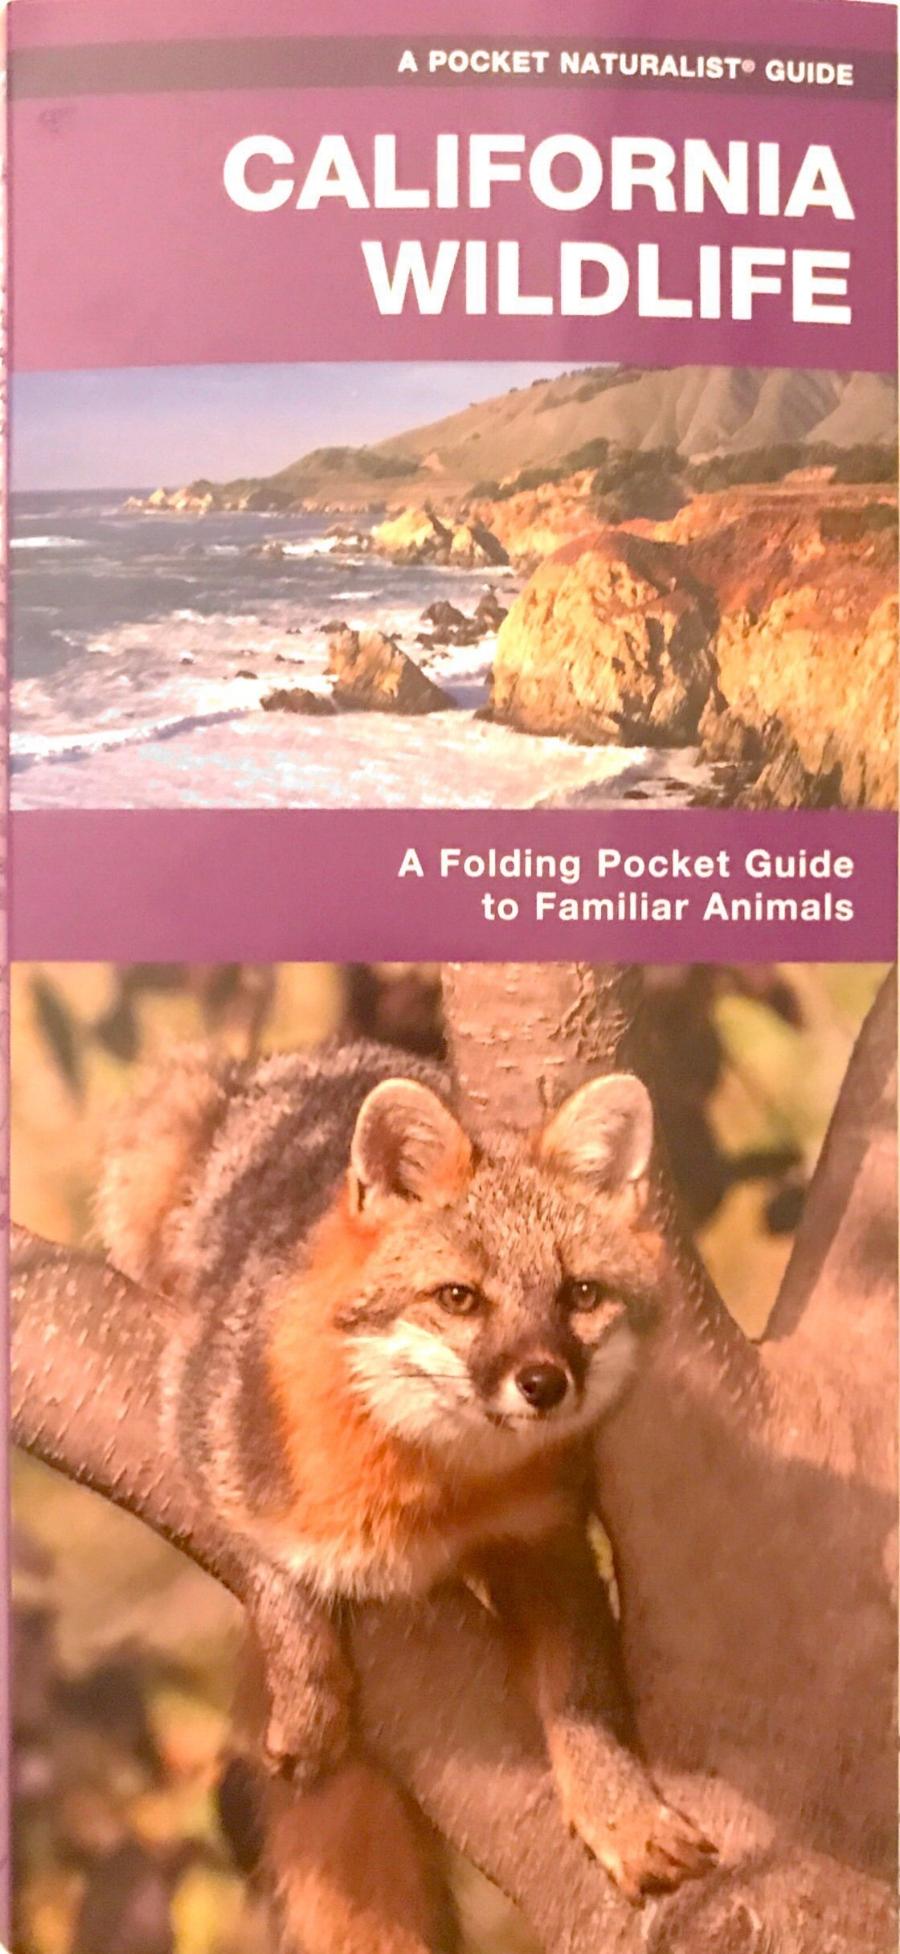 California Wildlife Pamphlet photo.JPG